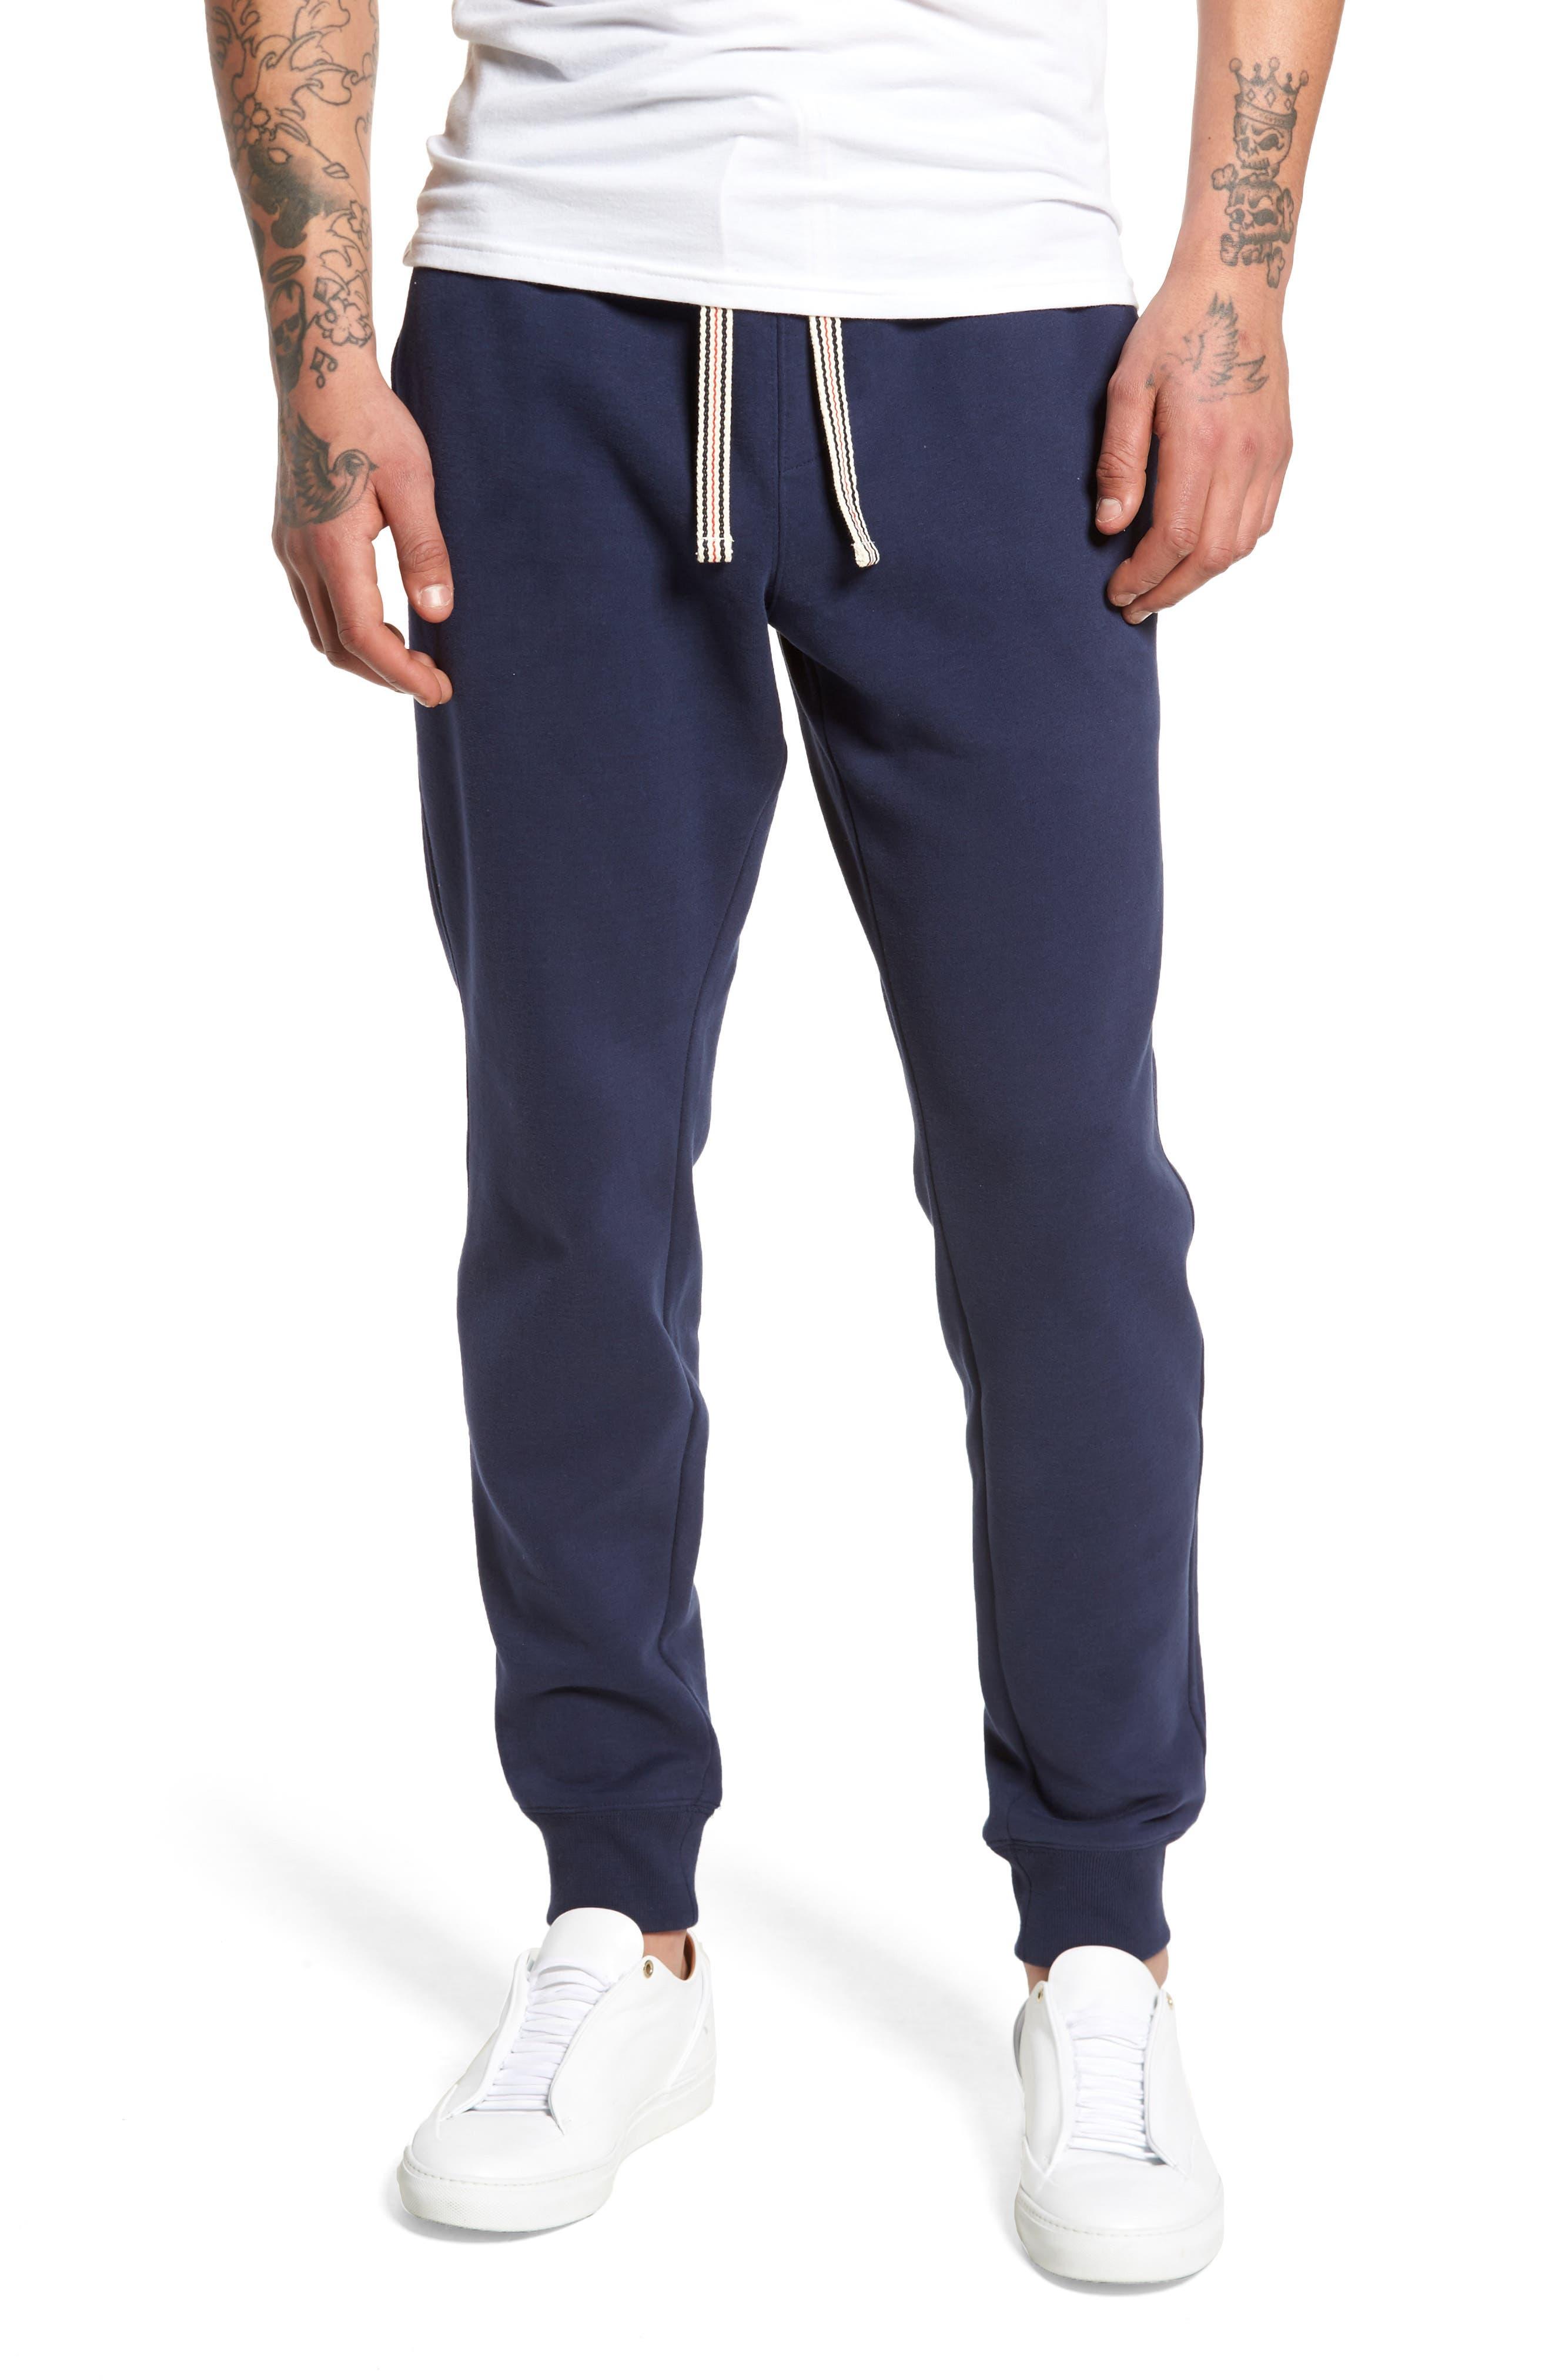 Jogger Pants,                         Main,                         color, Peacoat